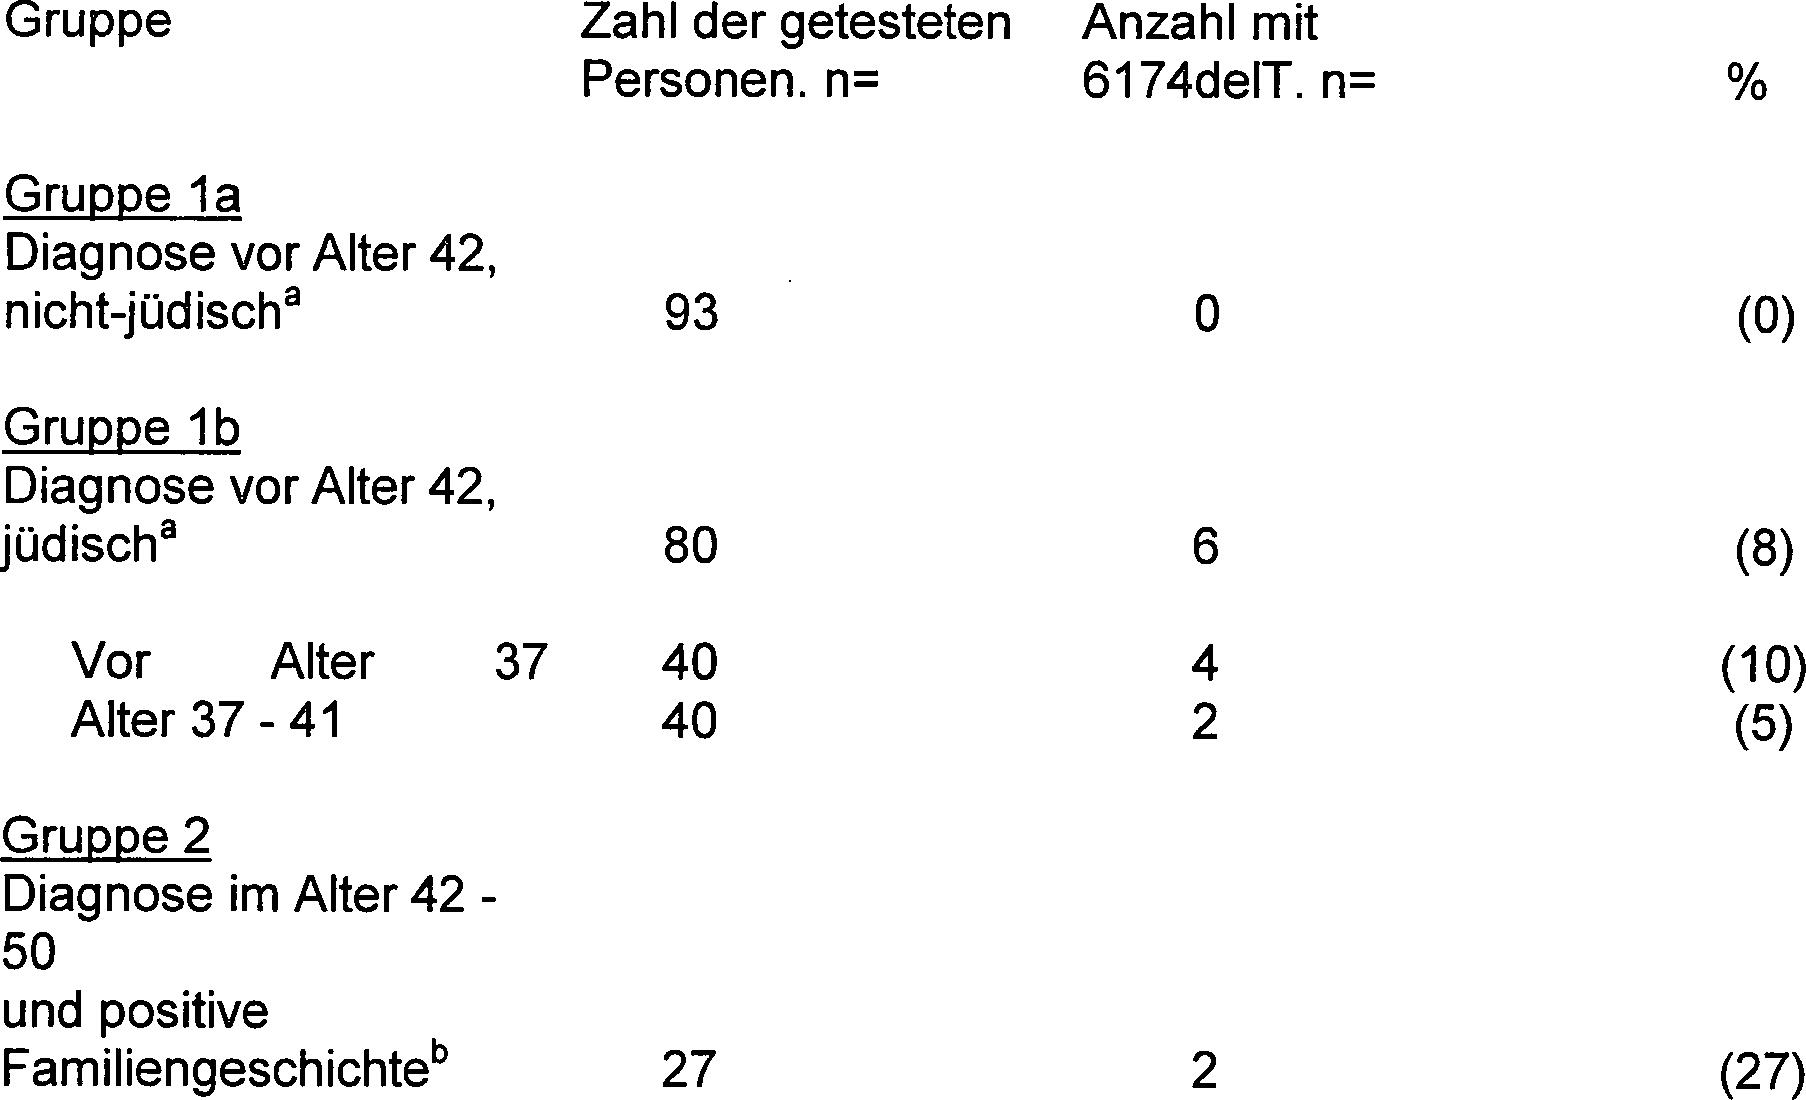 Bp faller i tabellen